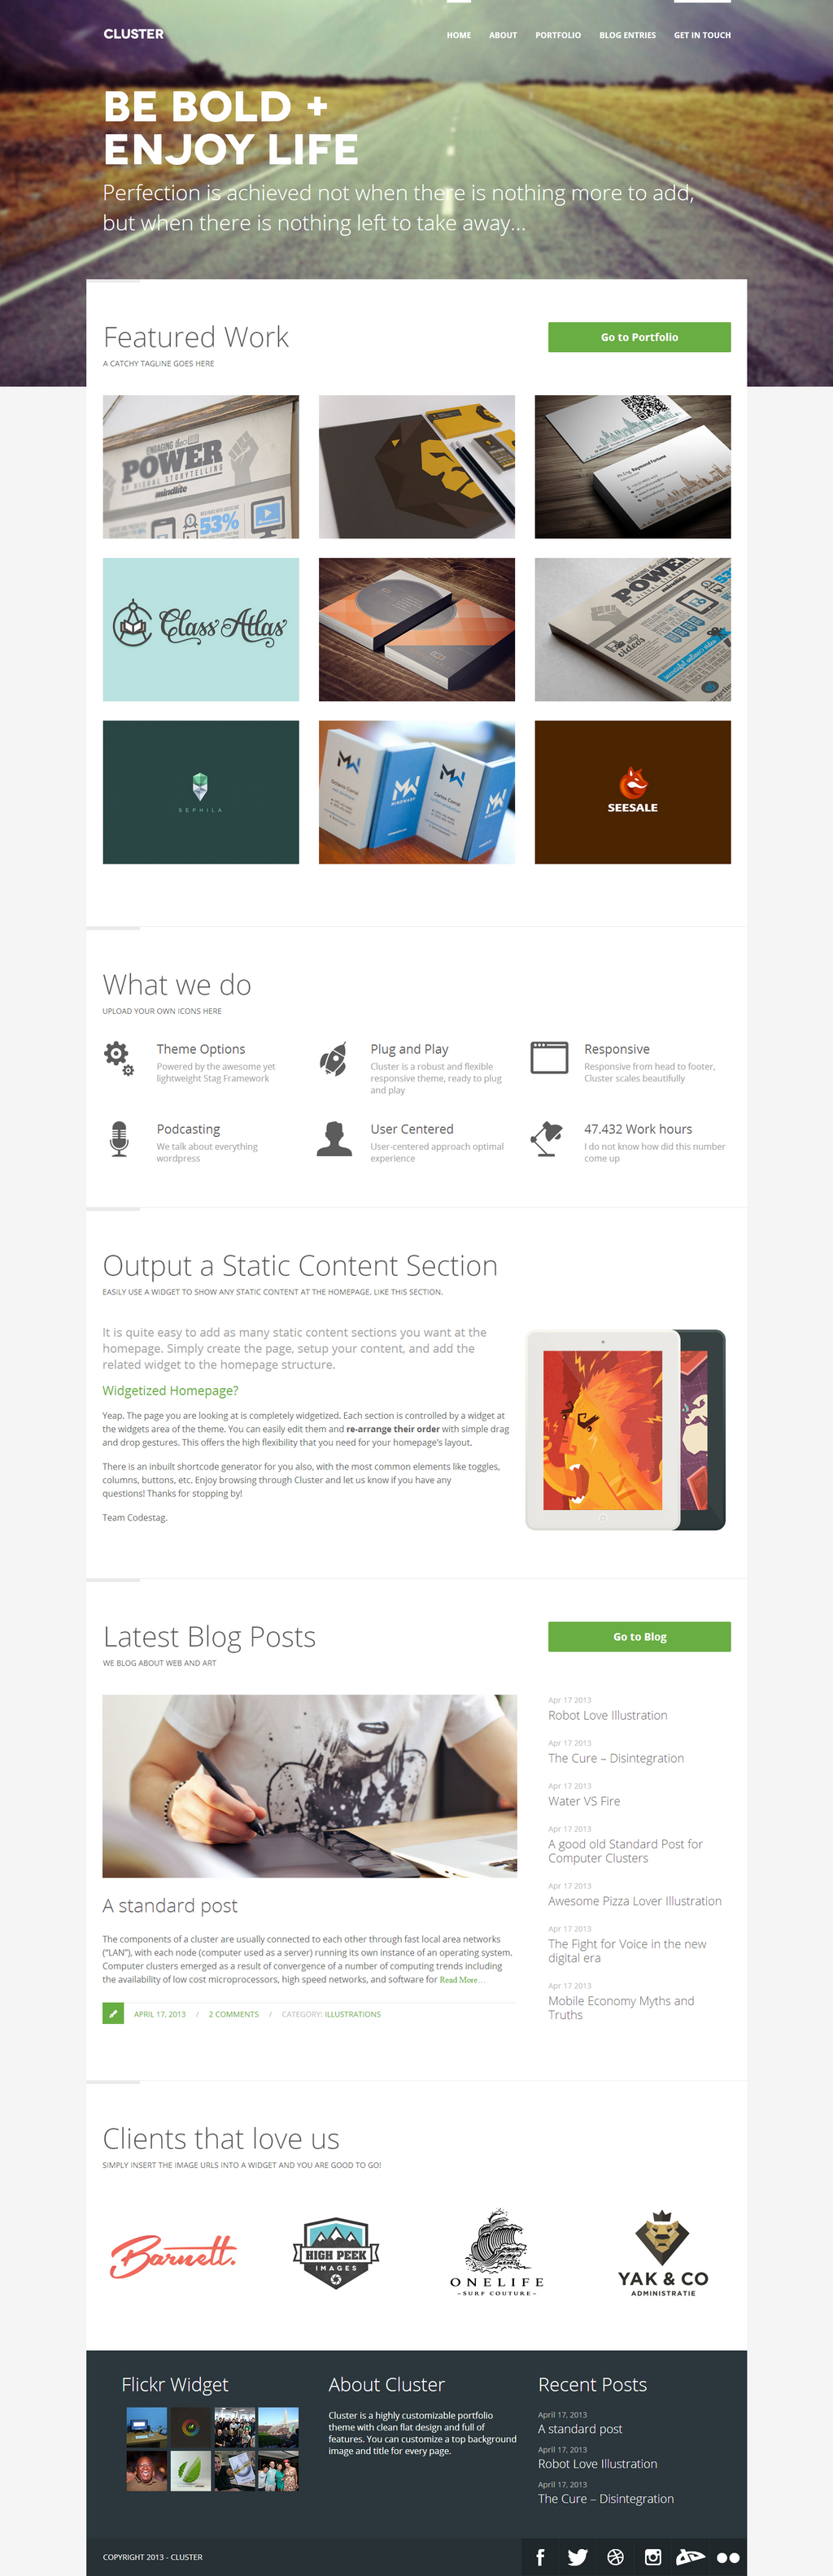 http://fc07.deviantart.net/fs71/i/2013/137/3/4/cluster_a_bold_portfolio_wordpress_theme_by_the_webdesign-d65lriz.png